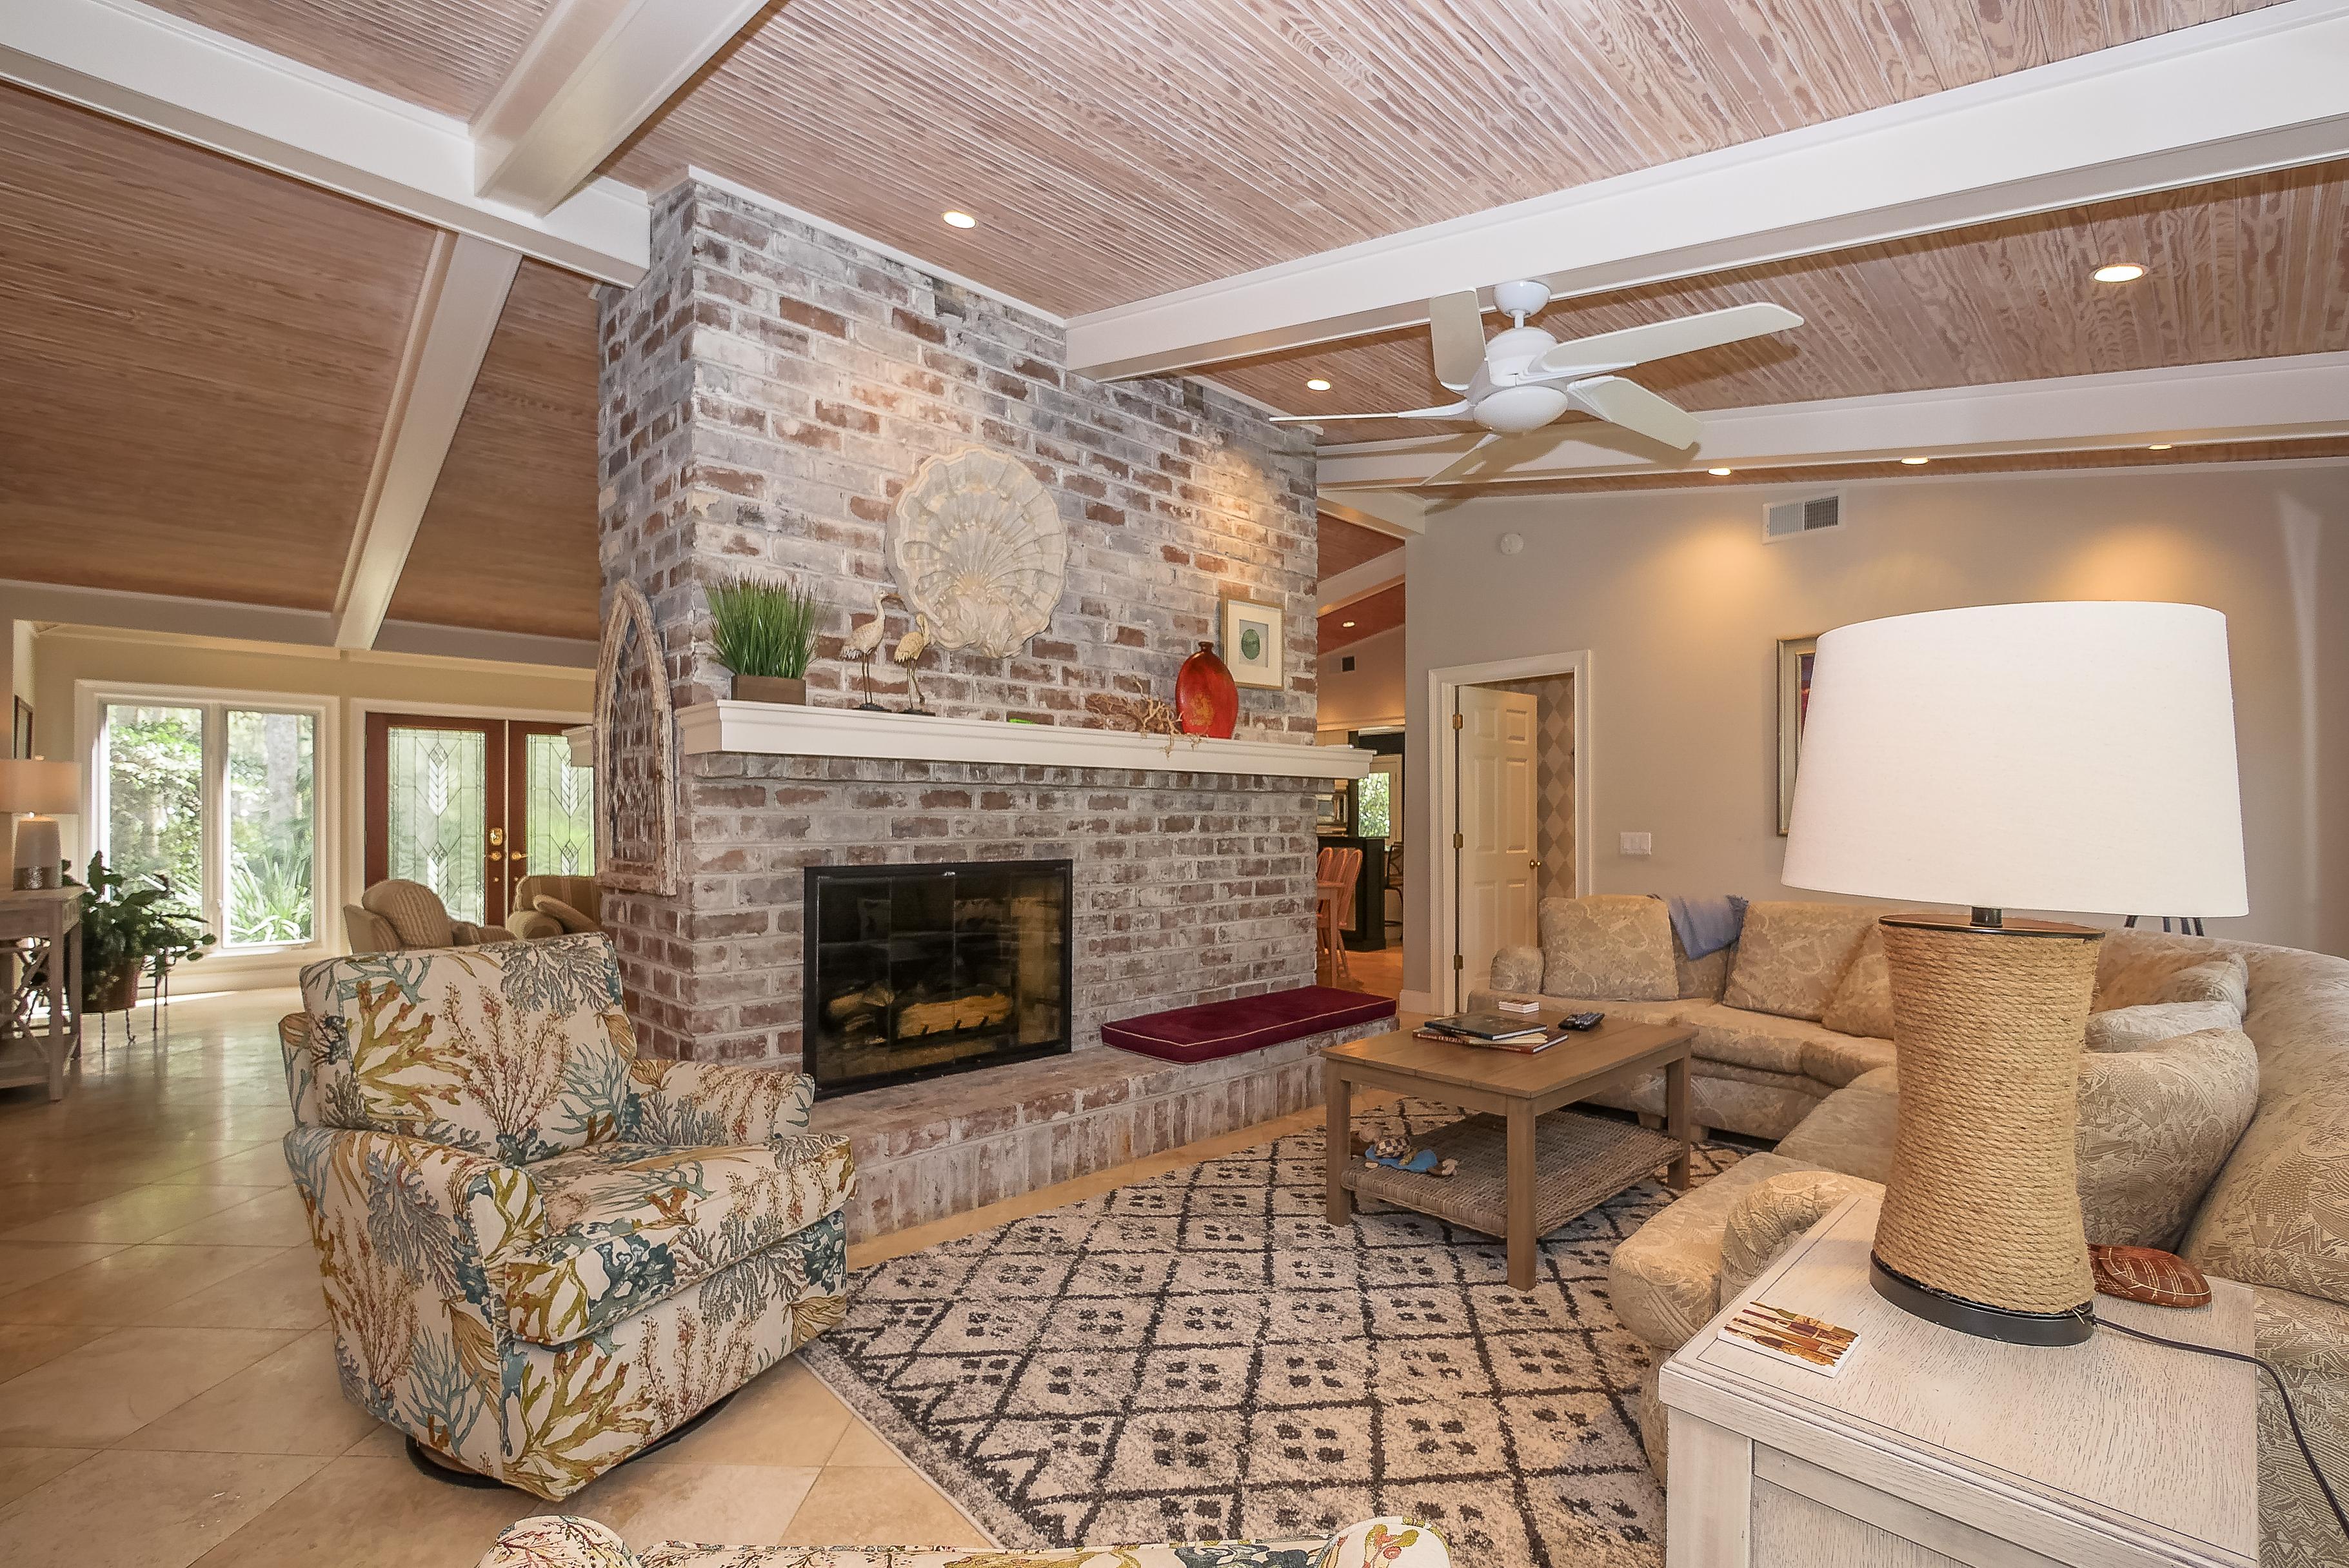 10 Woodbine Sea Pines Resort Home Vacation Rental In Hilton Head Island    RedAwning